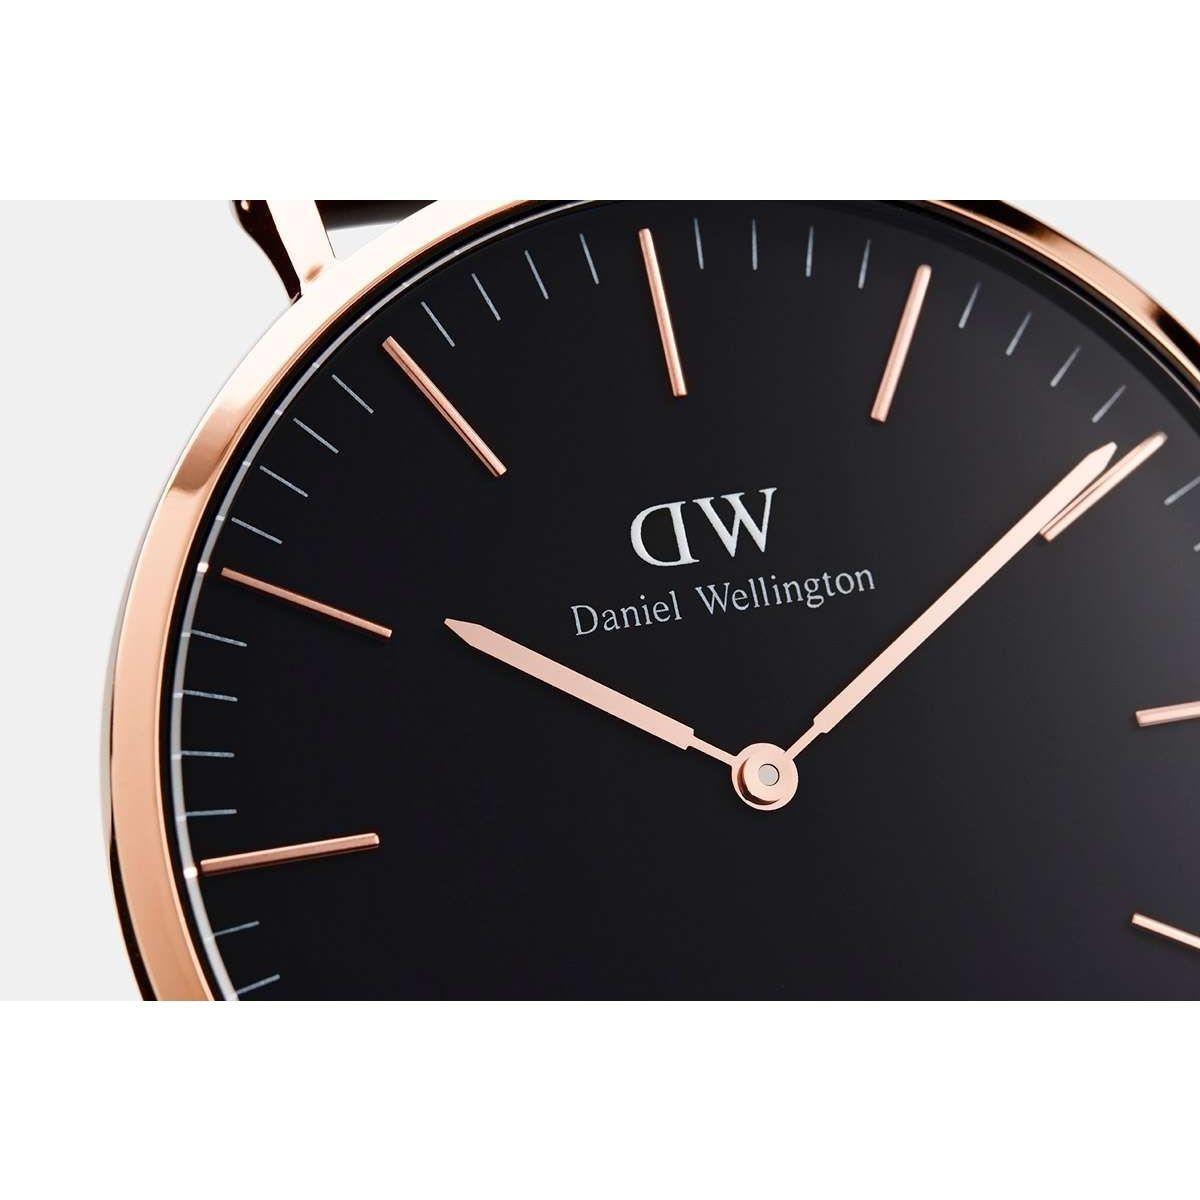 dw官网 dw手表官网 dw中国官网 dw官方旗舰店 DW DW官网  W Classic Black Cornwall RG 36mm